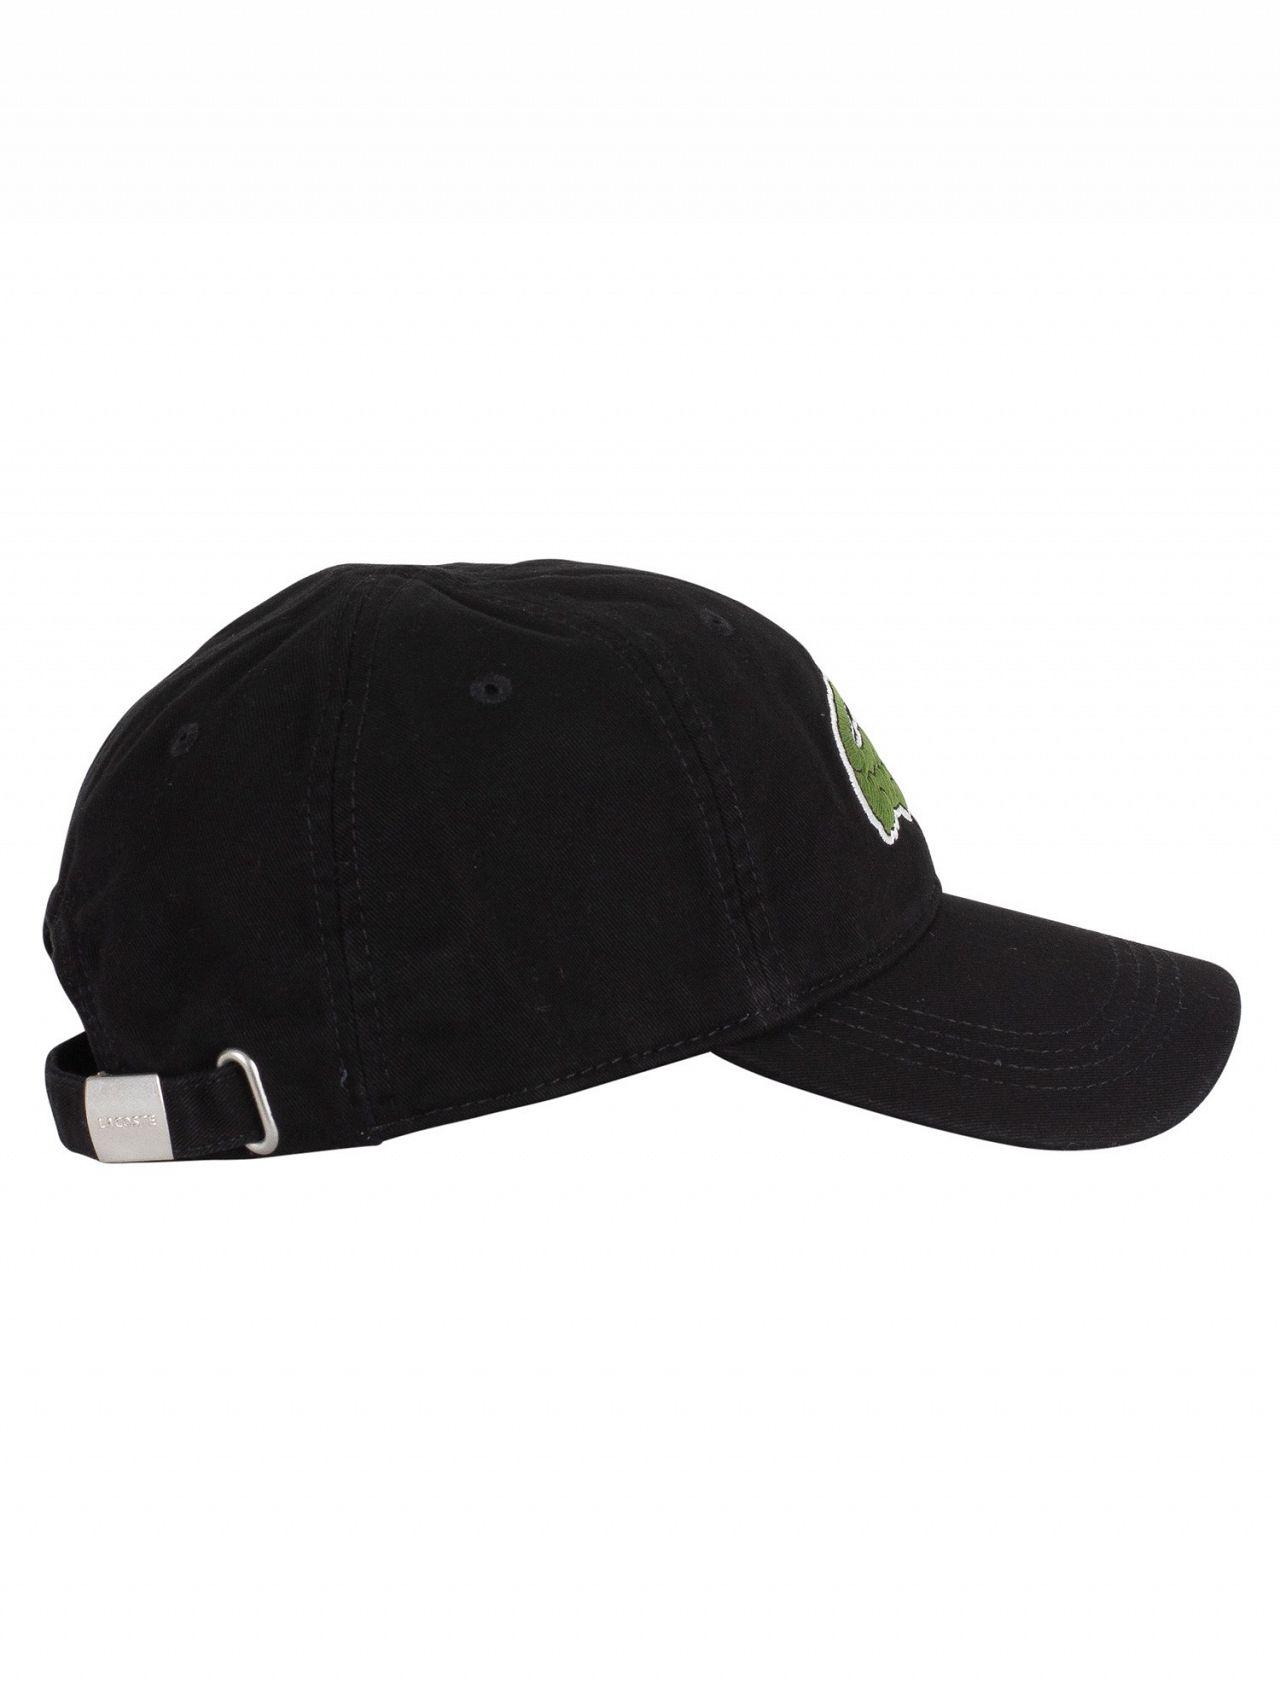 ba3bb9f8861 ... coupon code for lacoste black big logo baseball cap b2706 f75a5